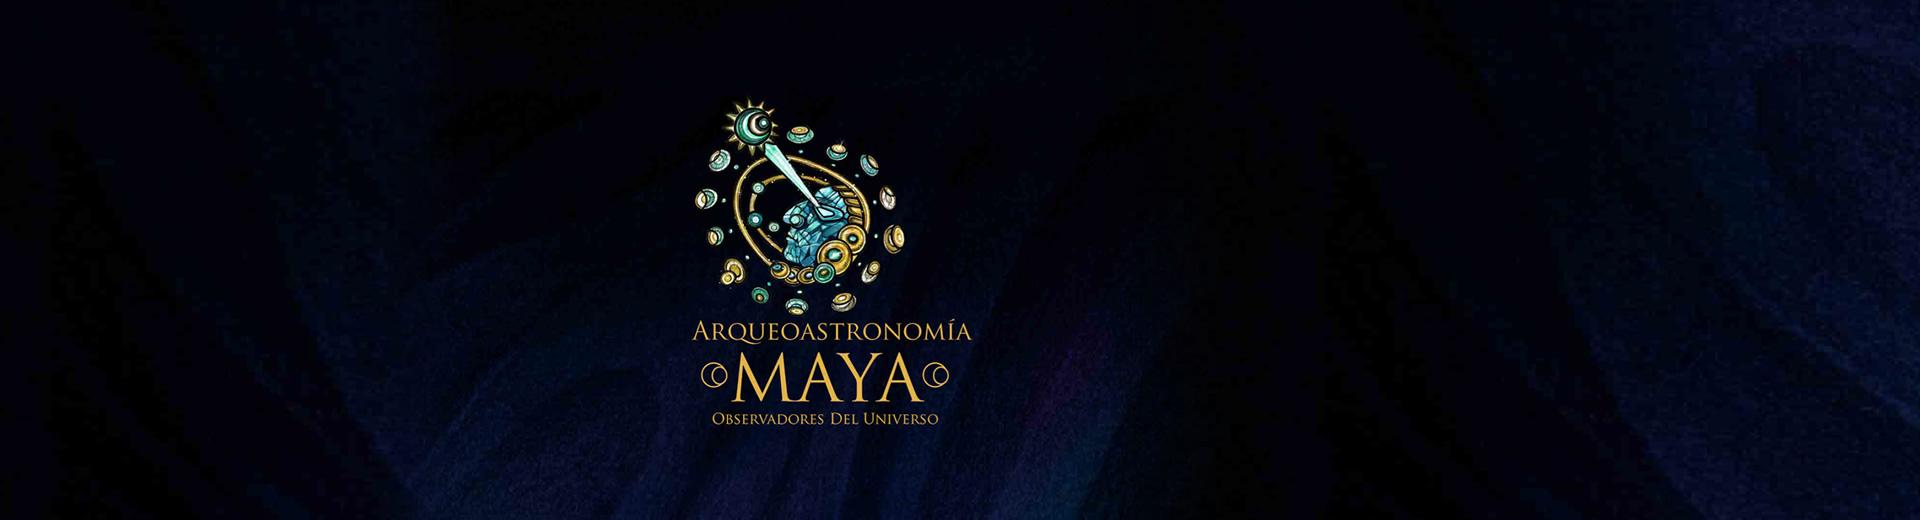 Arqueoastronomía Maya